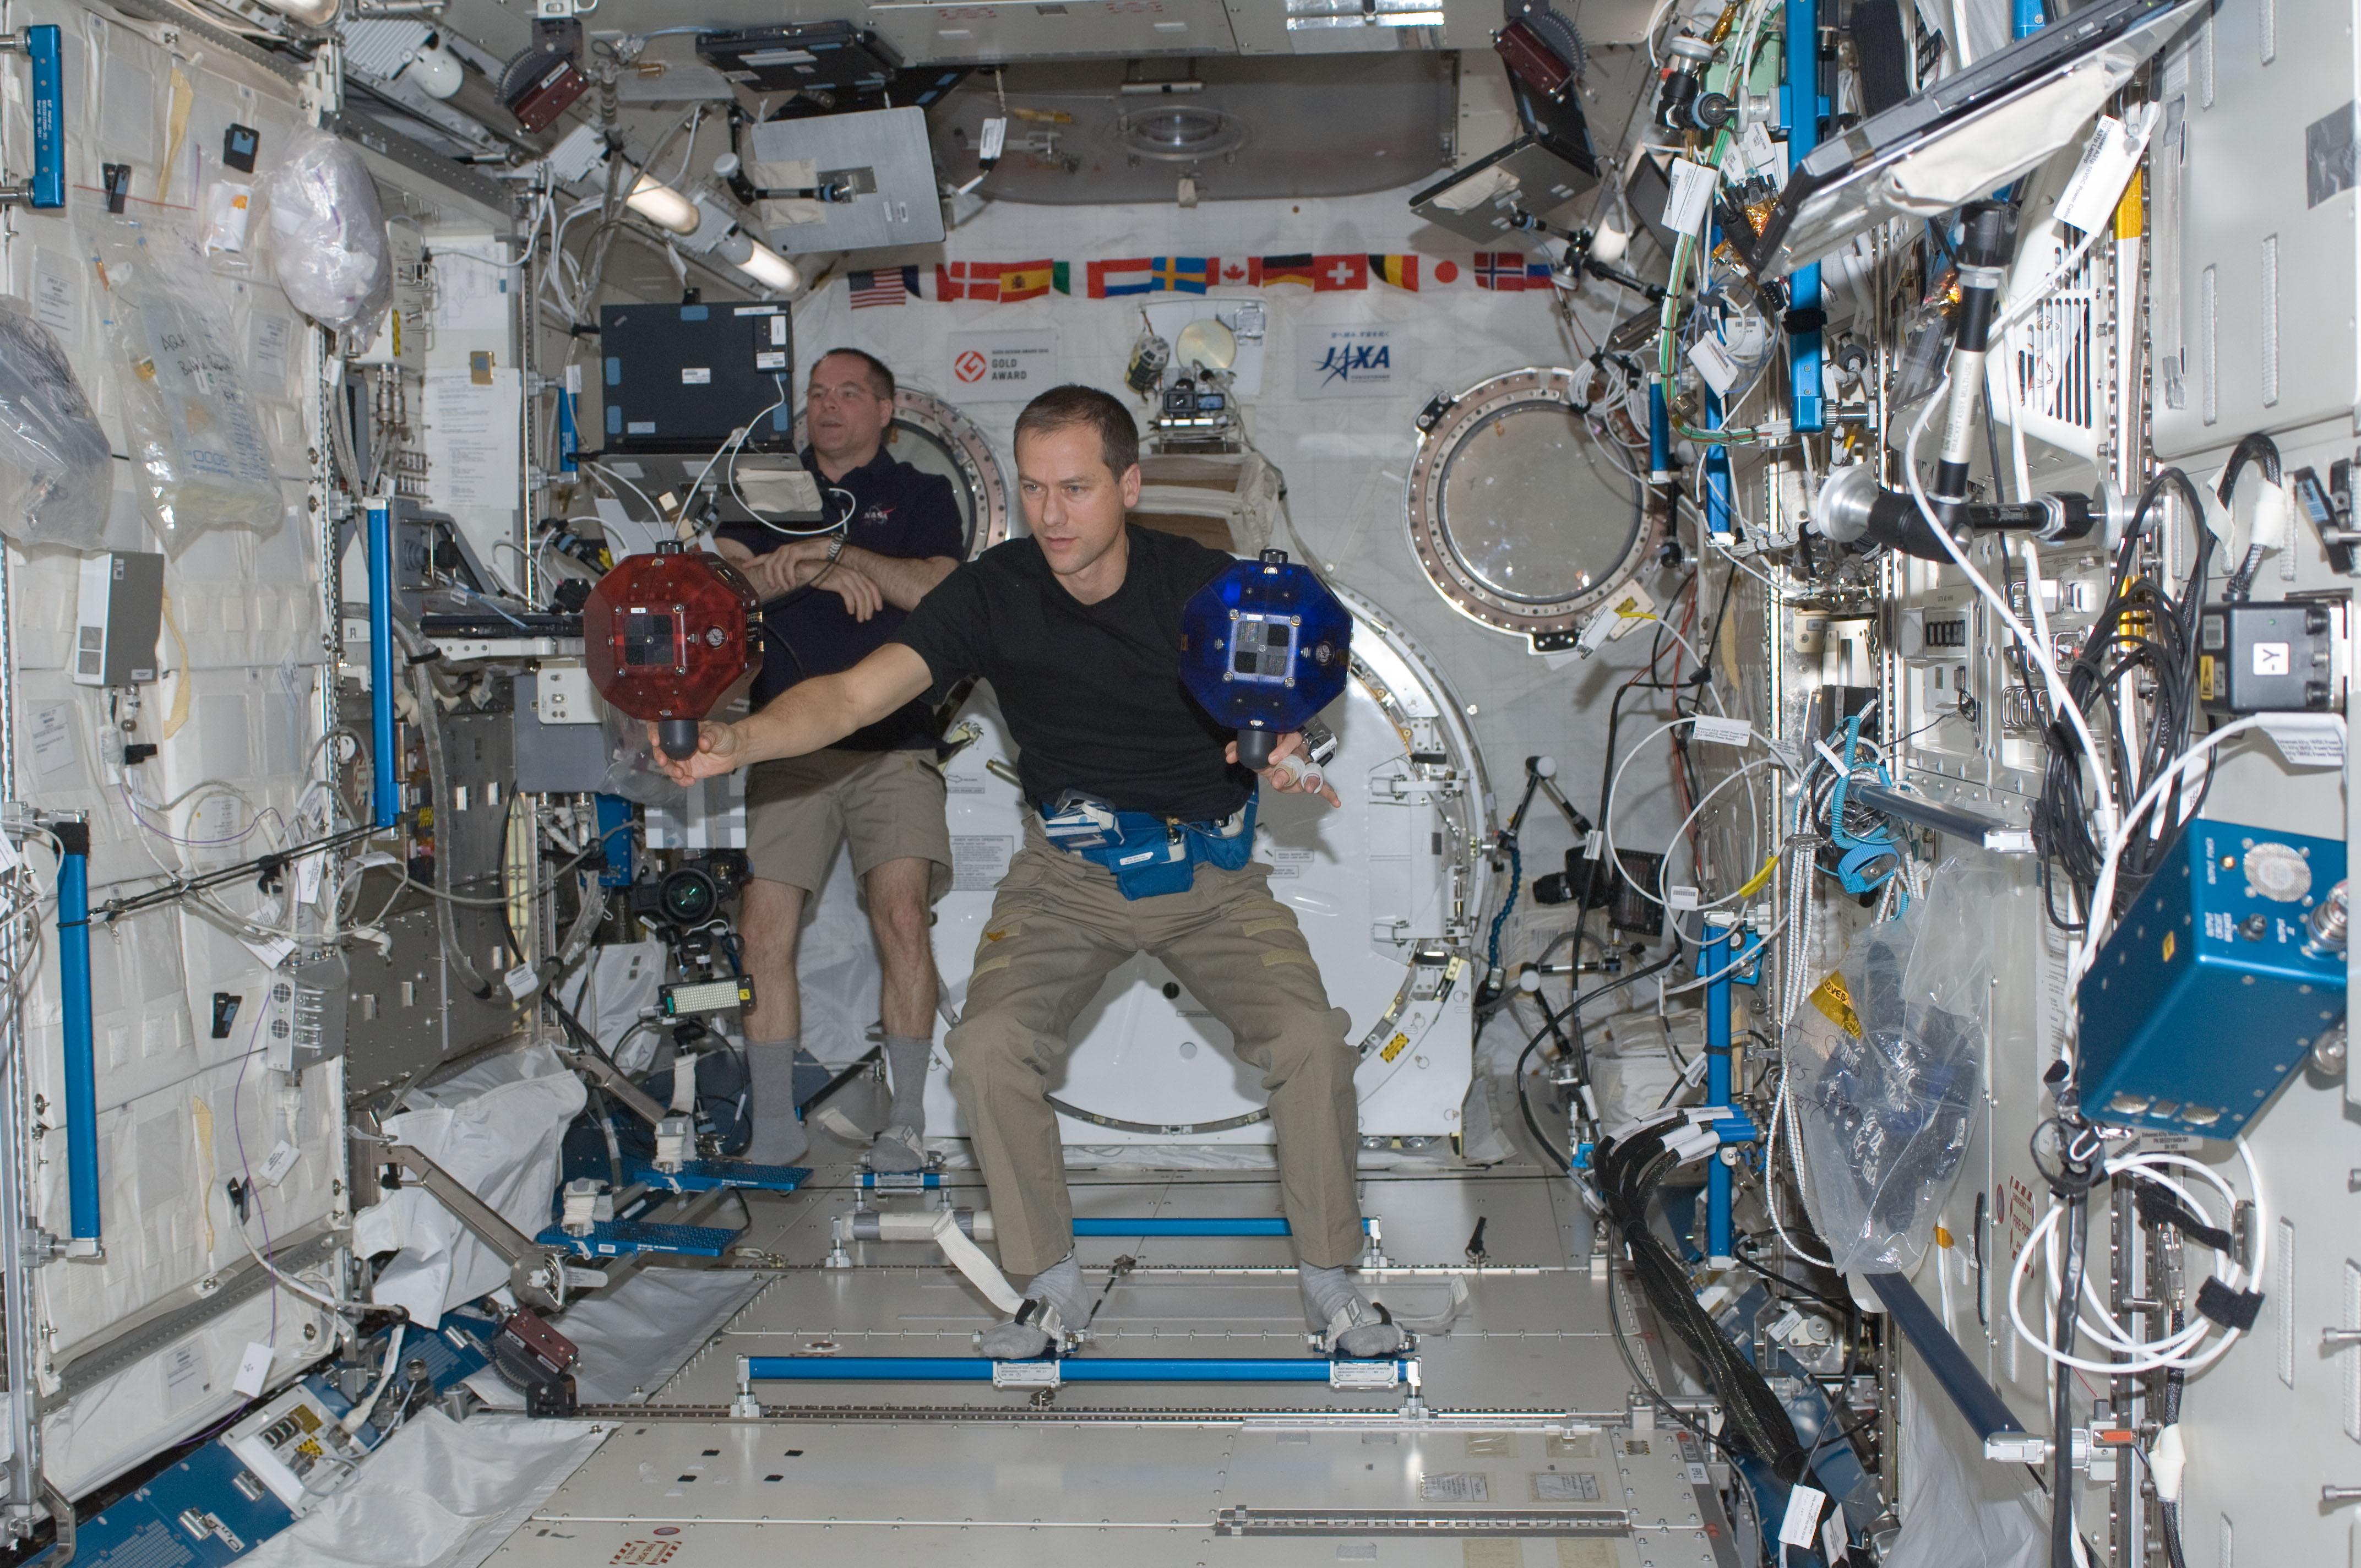 international space station astronauts list - photo #37